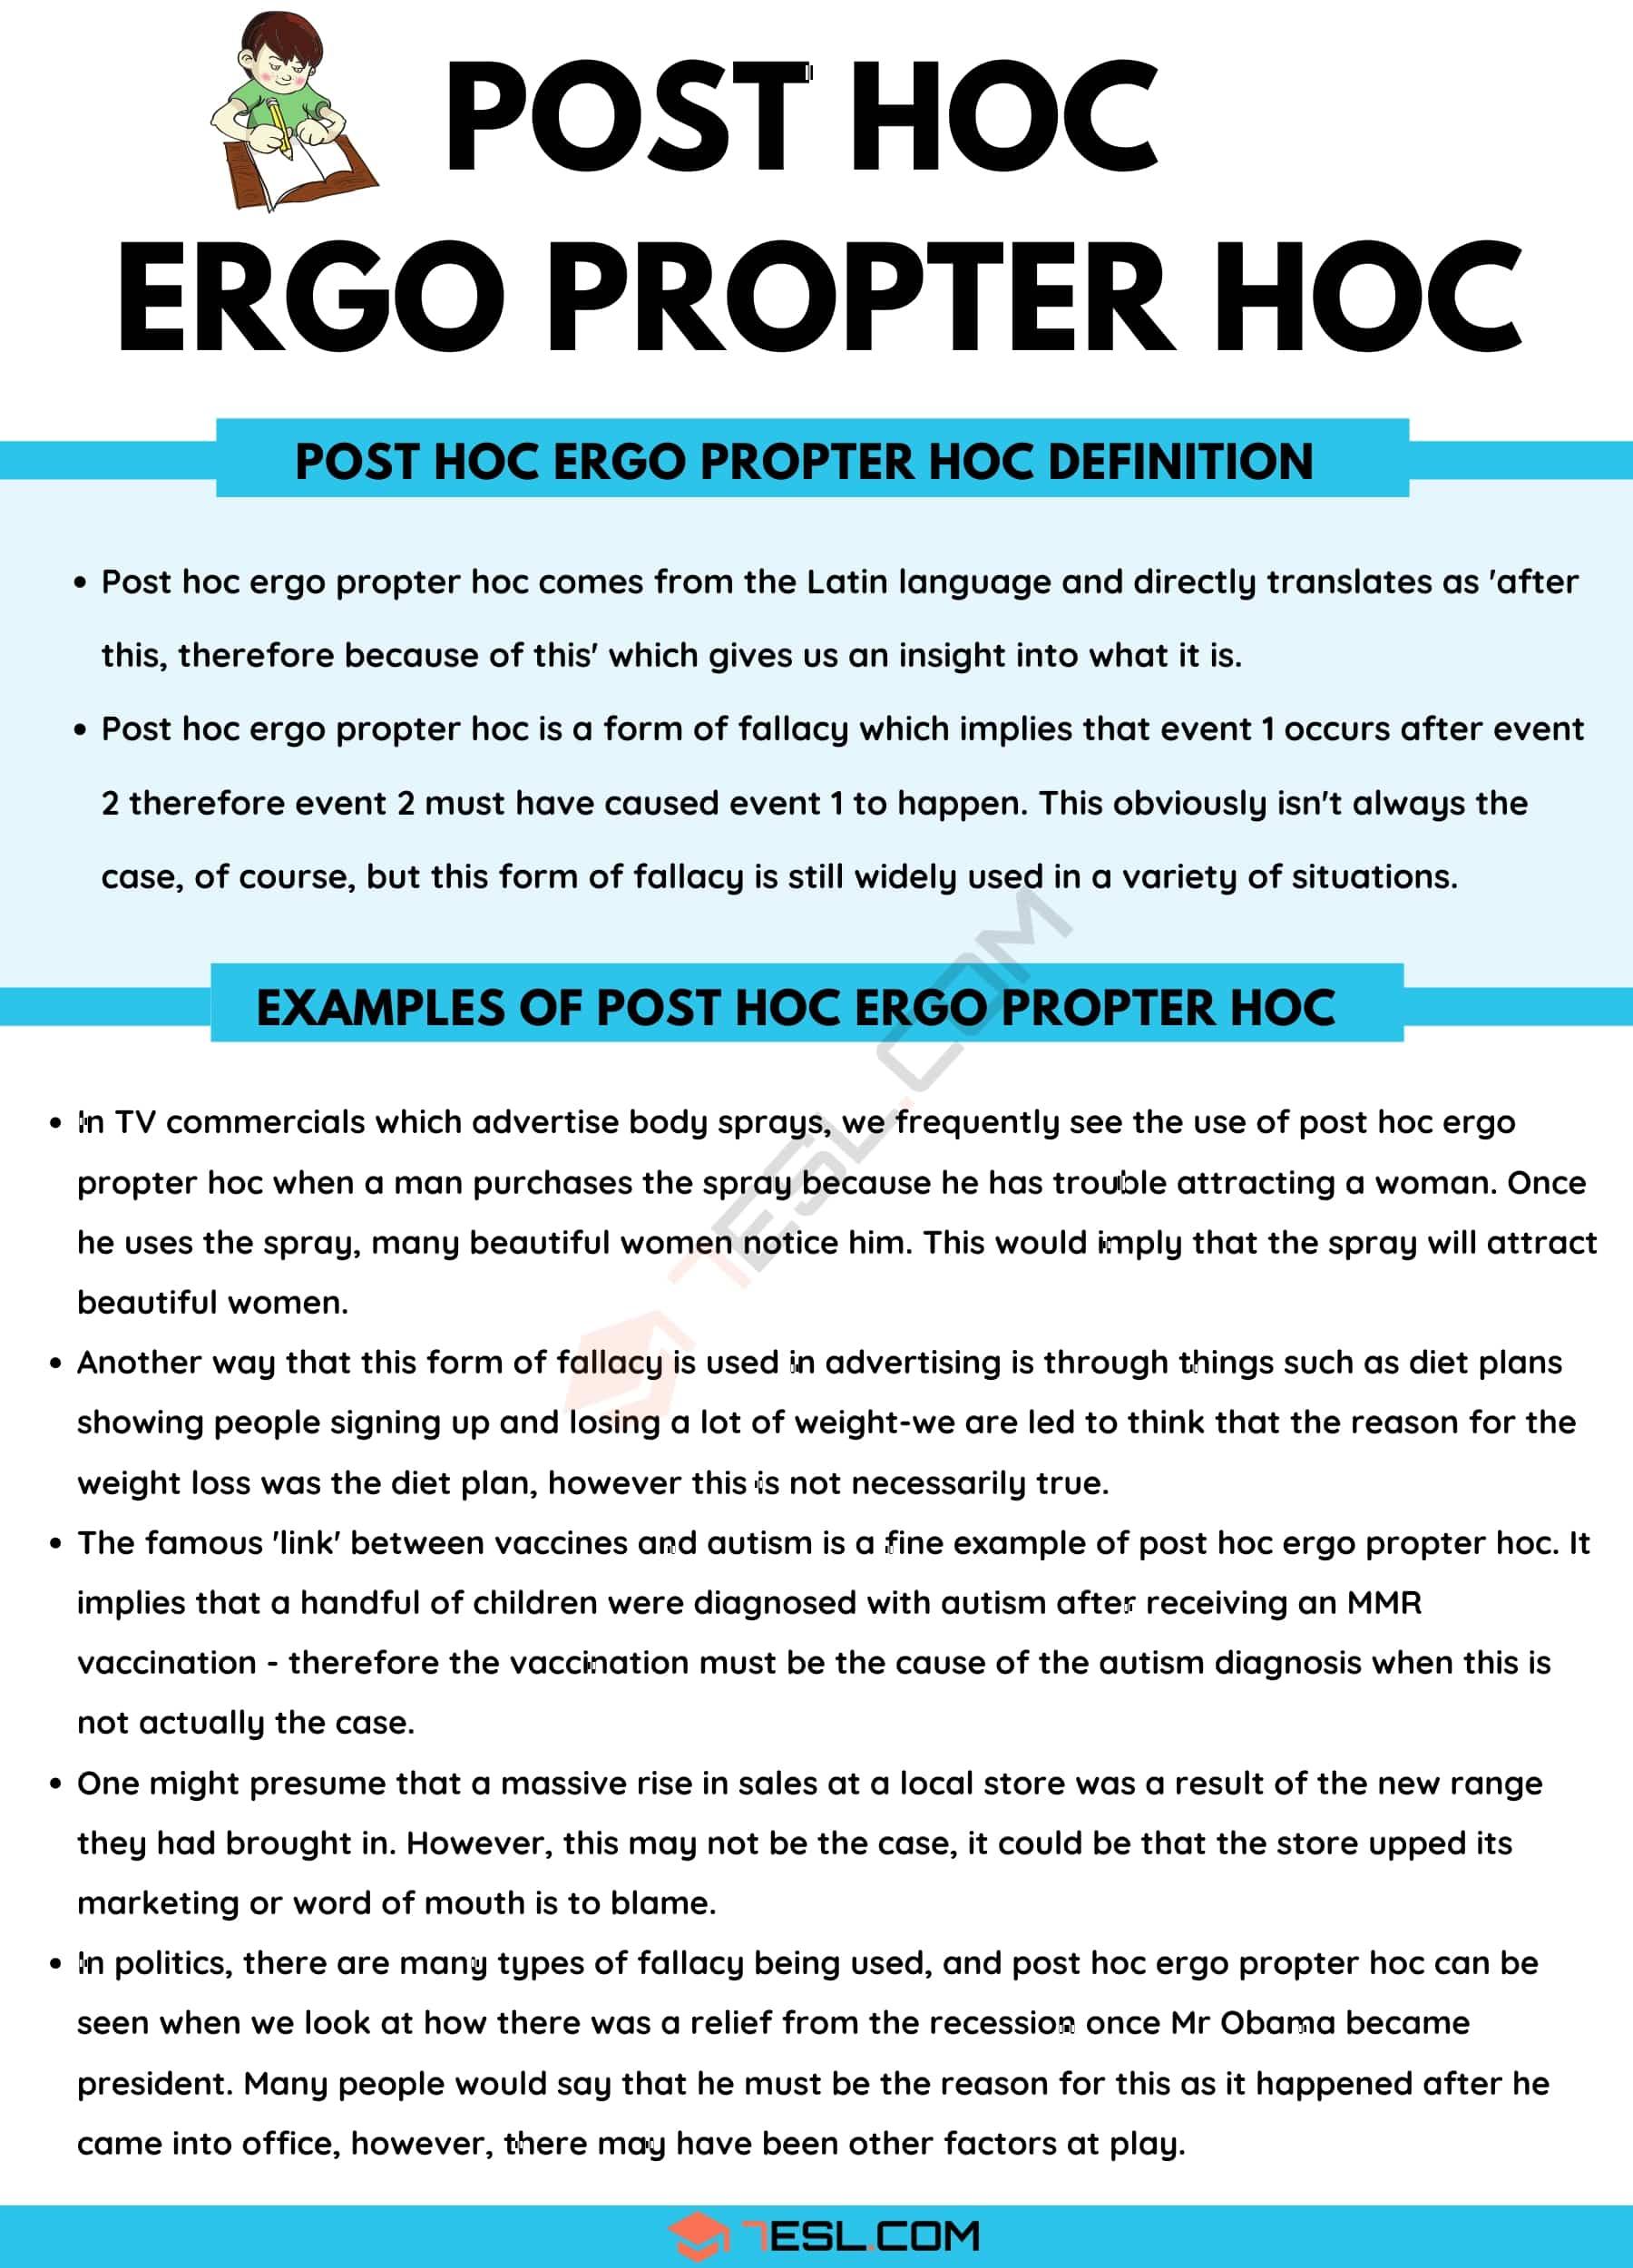 Post Hoc Ergo Propter Hoc: Definition and Useful Examples of Post Hoc Ergo Propter Hoc